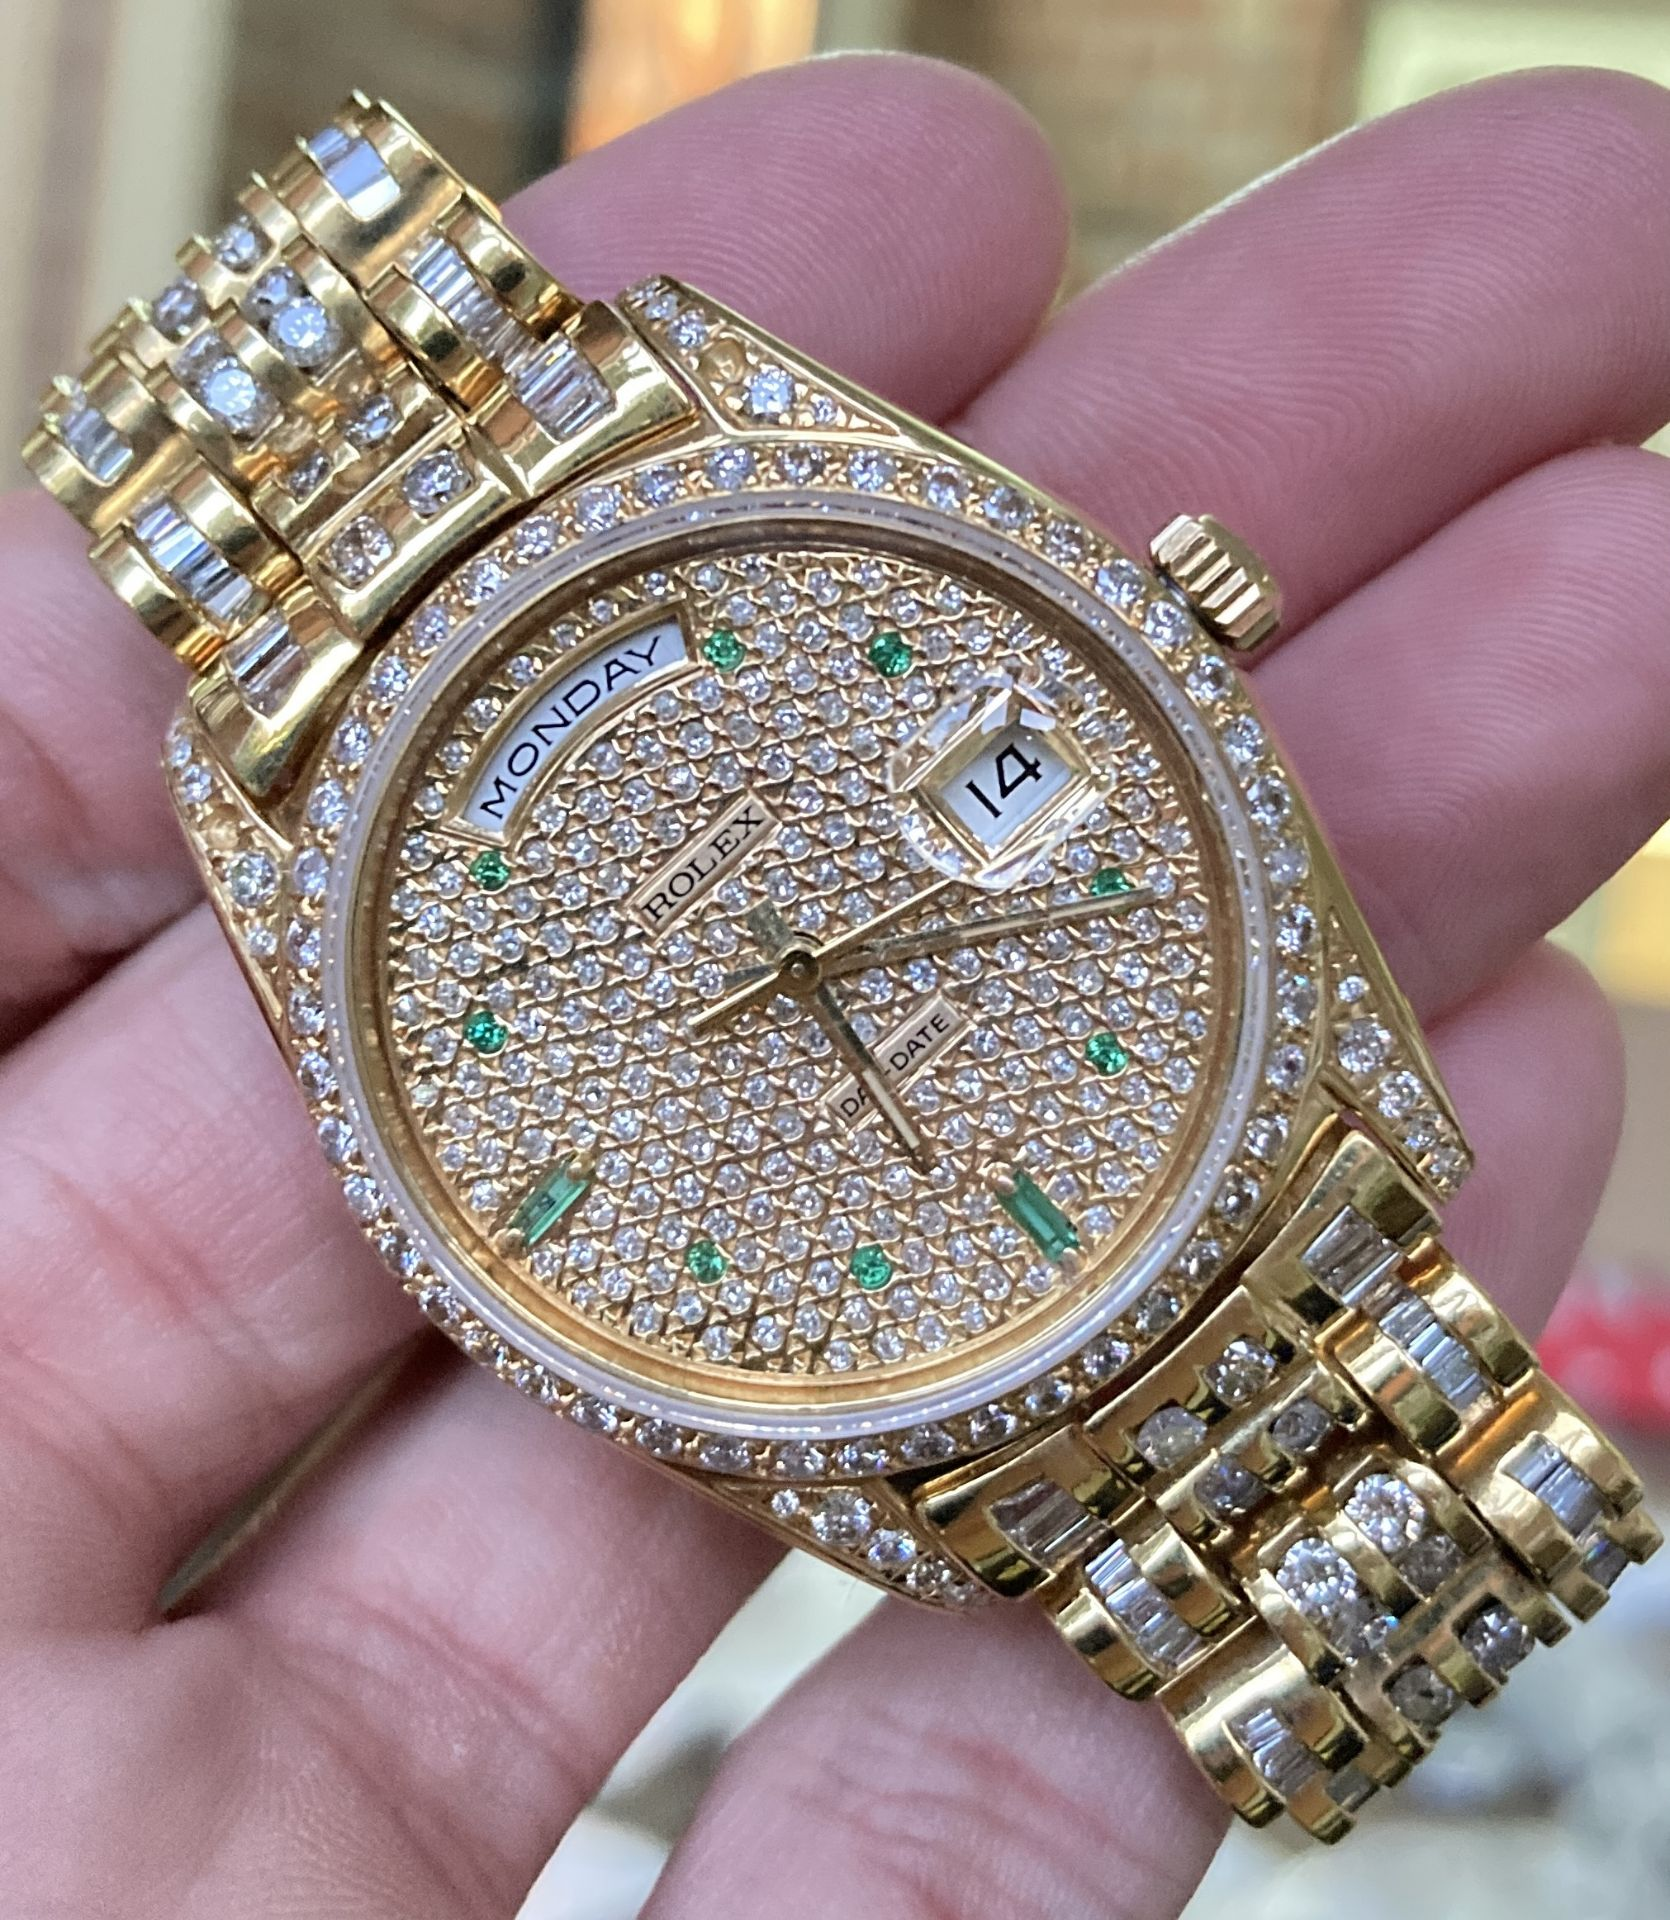 GENTS 36mm ROLEX DAYDATE YELLOW GOLD DIAMOND WATCH - Image 5 of 21